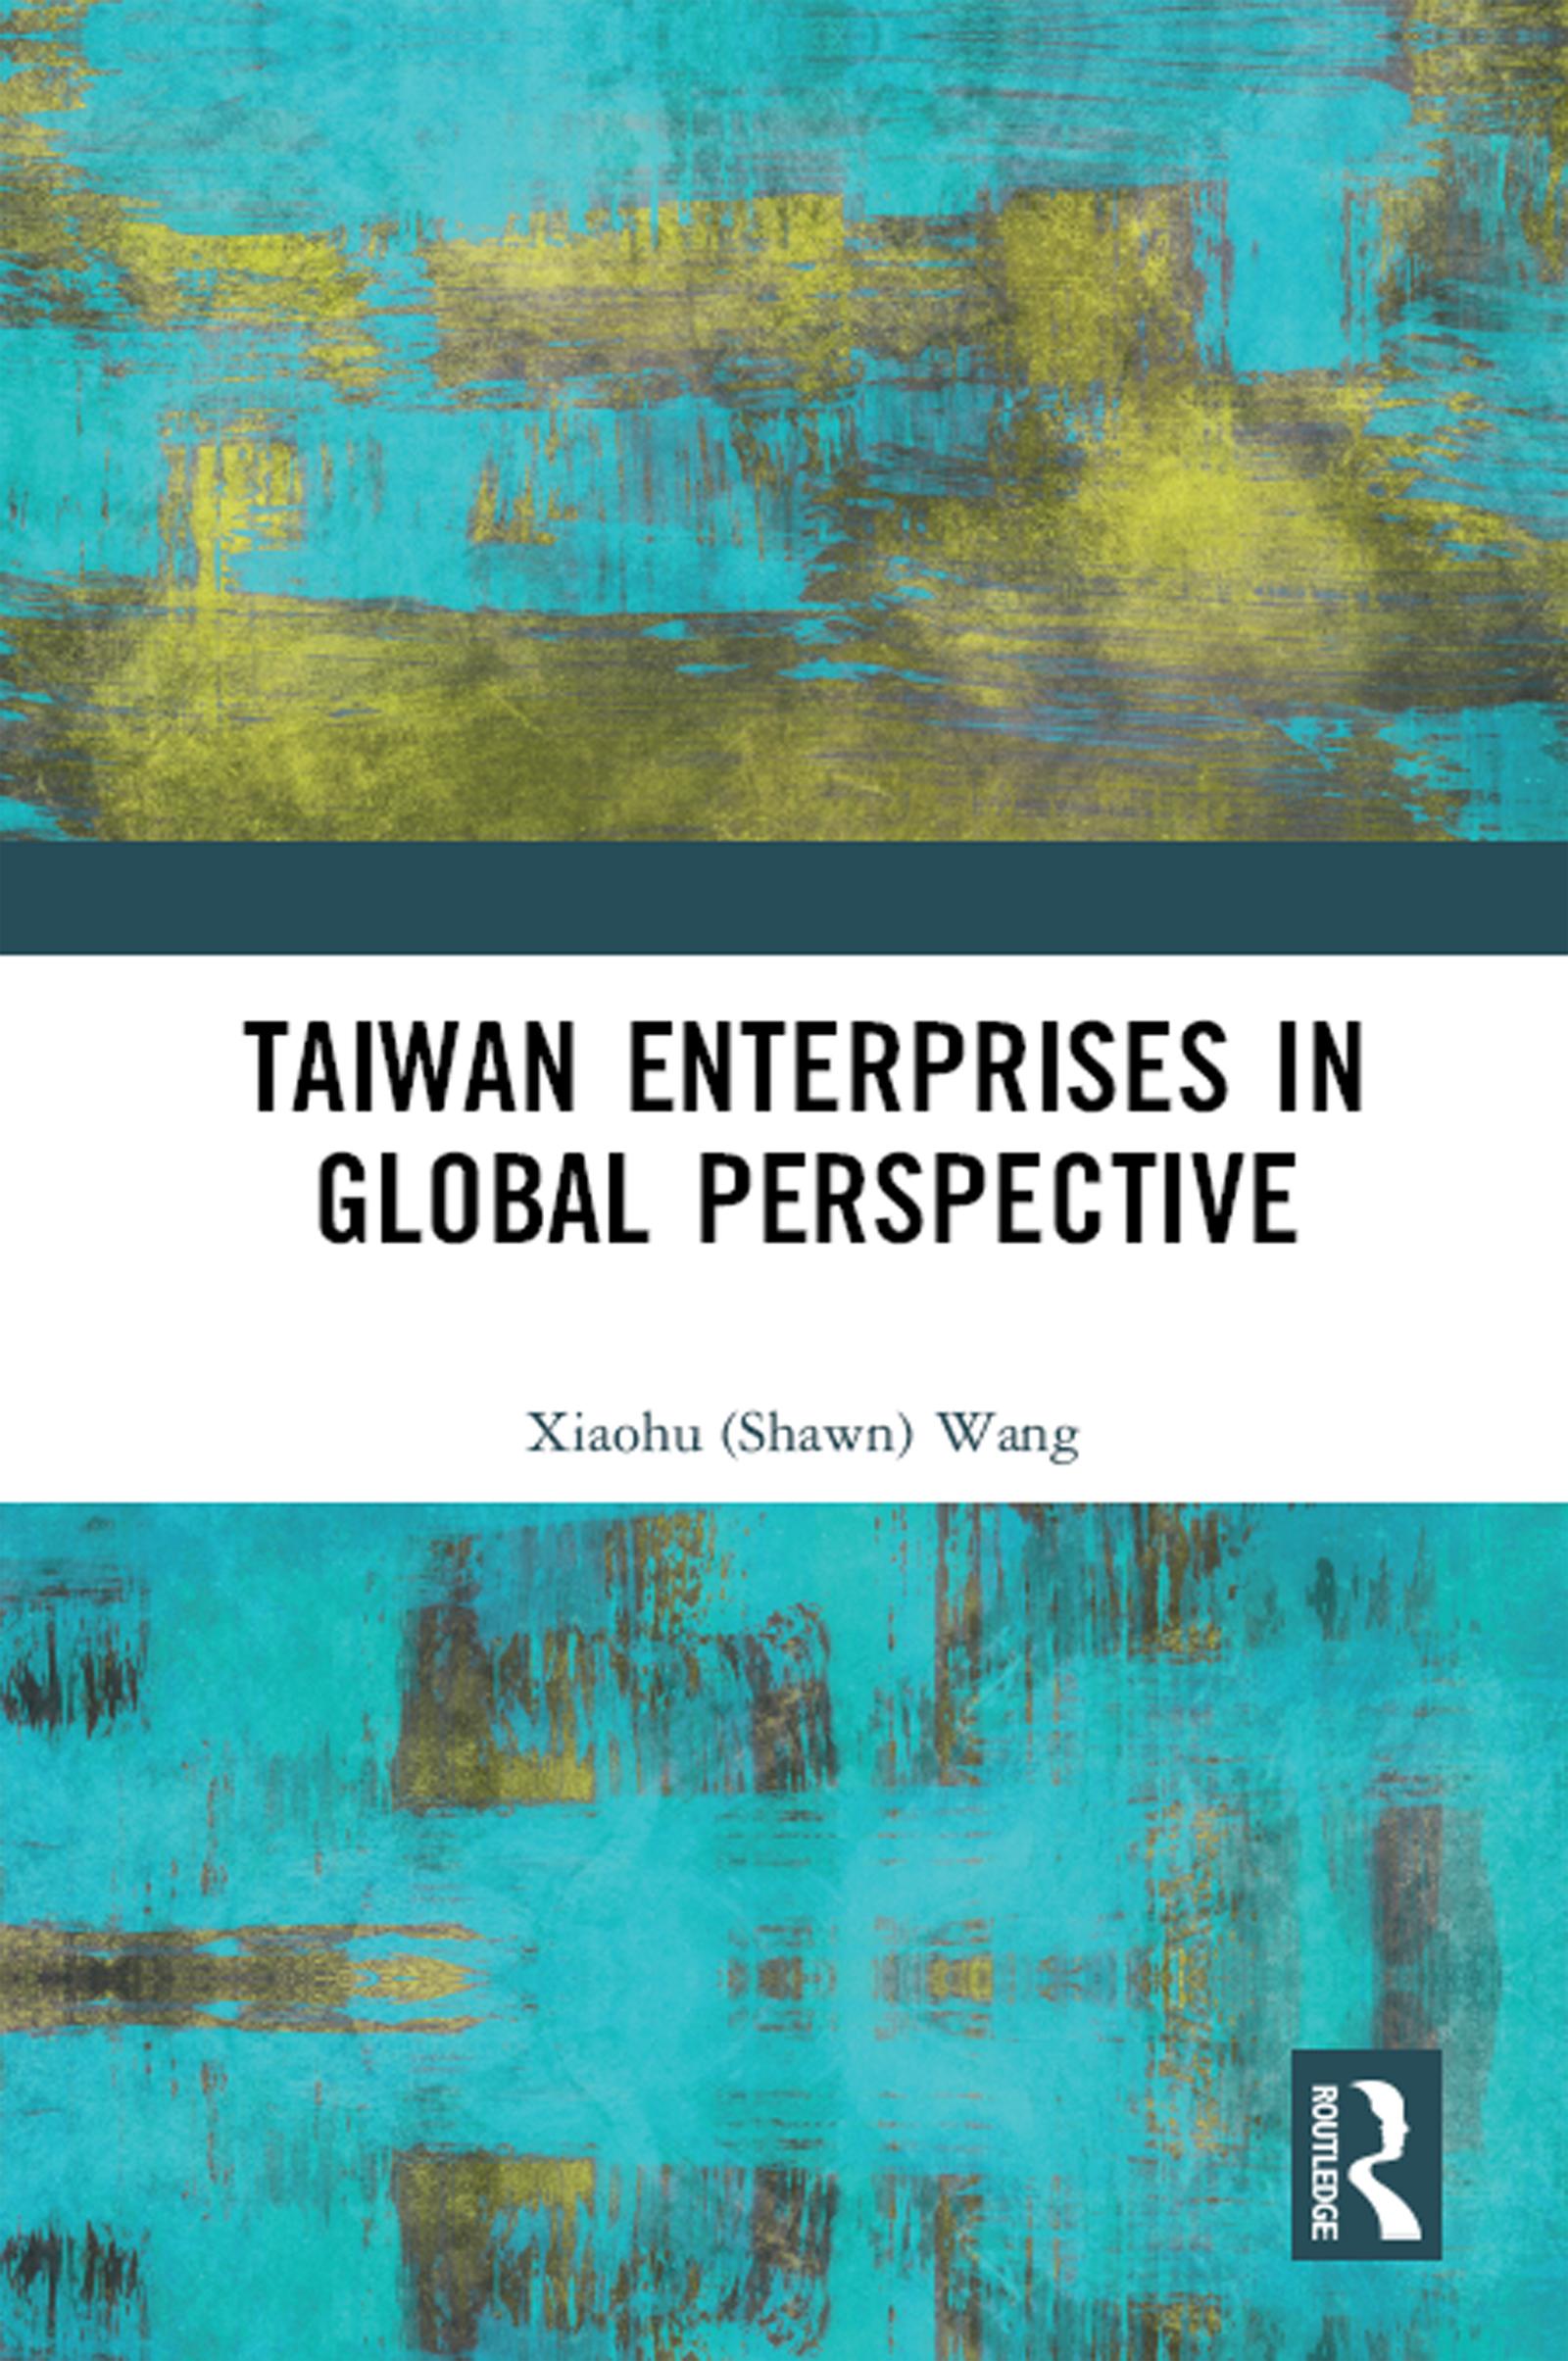 Taiwan Enterprises in Global Perspective